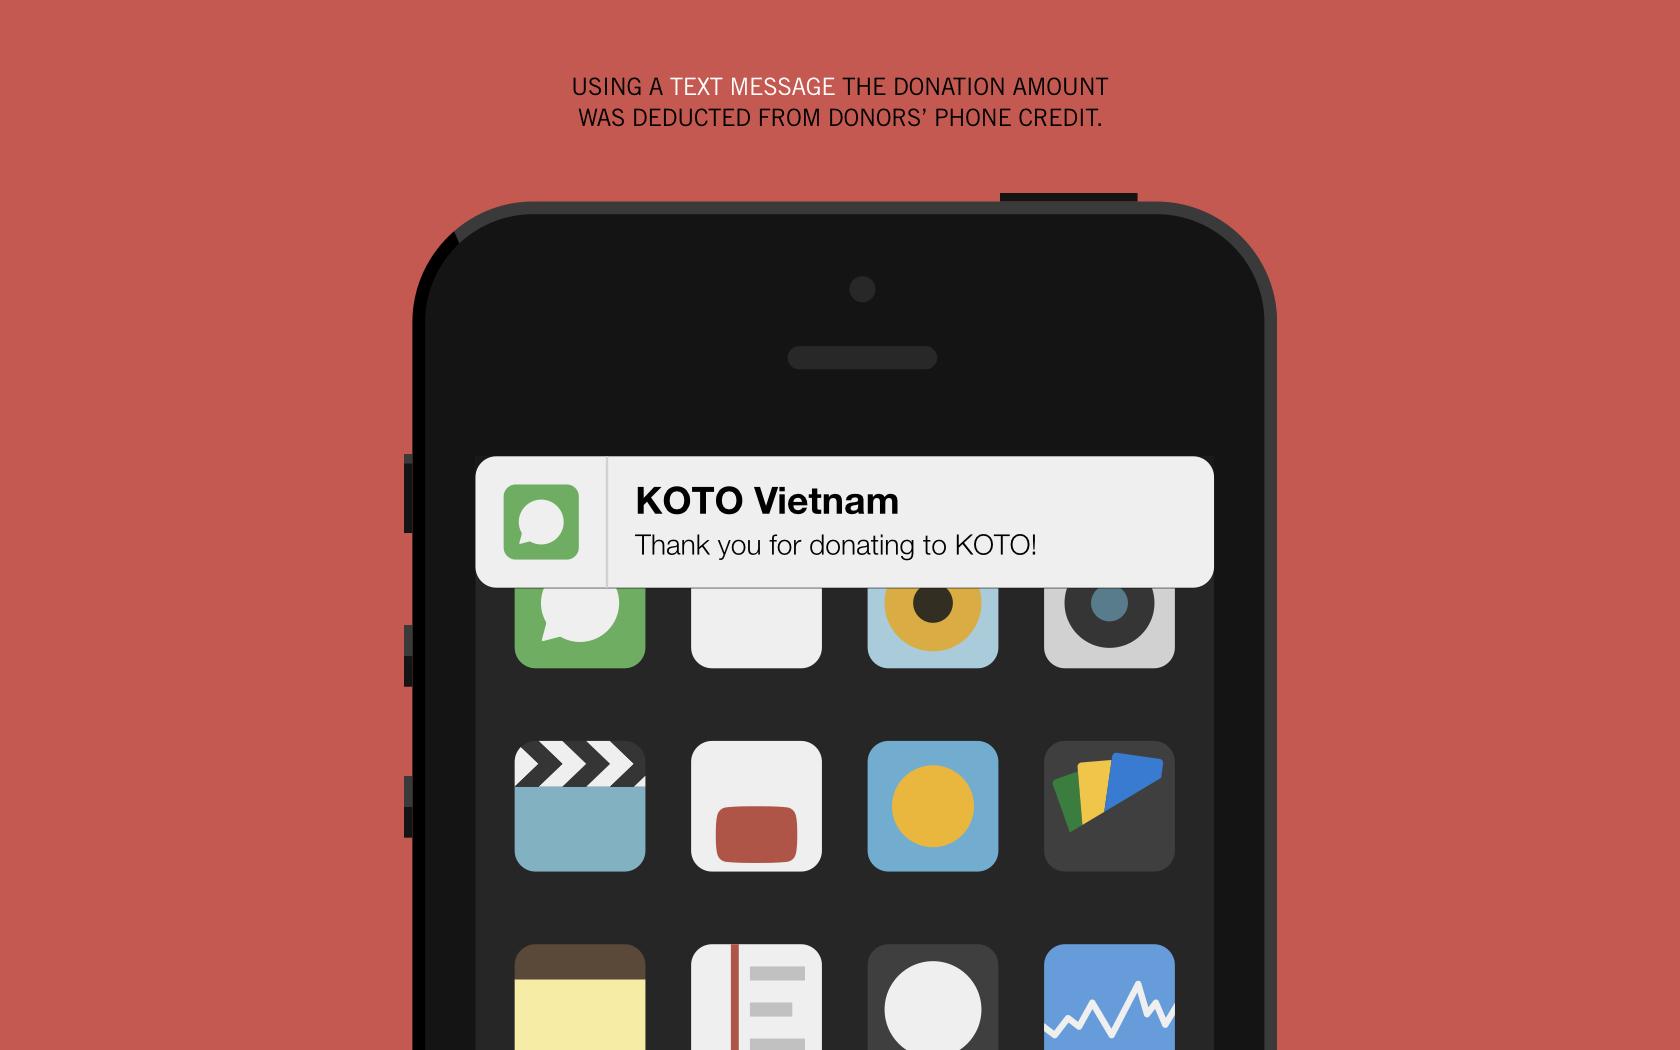 KOTO - Case Study FINAL 02162019.016.jpeg